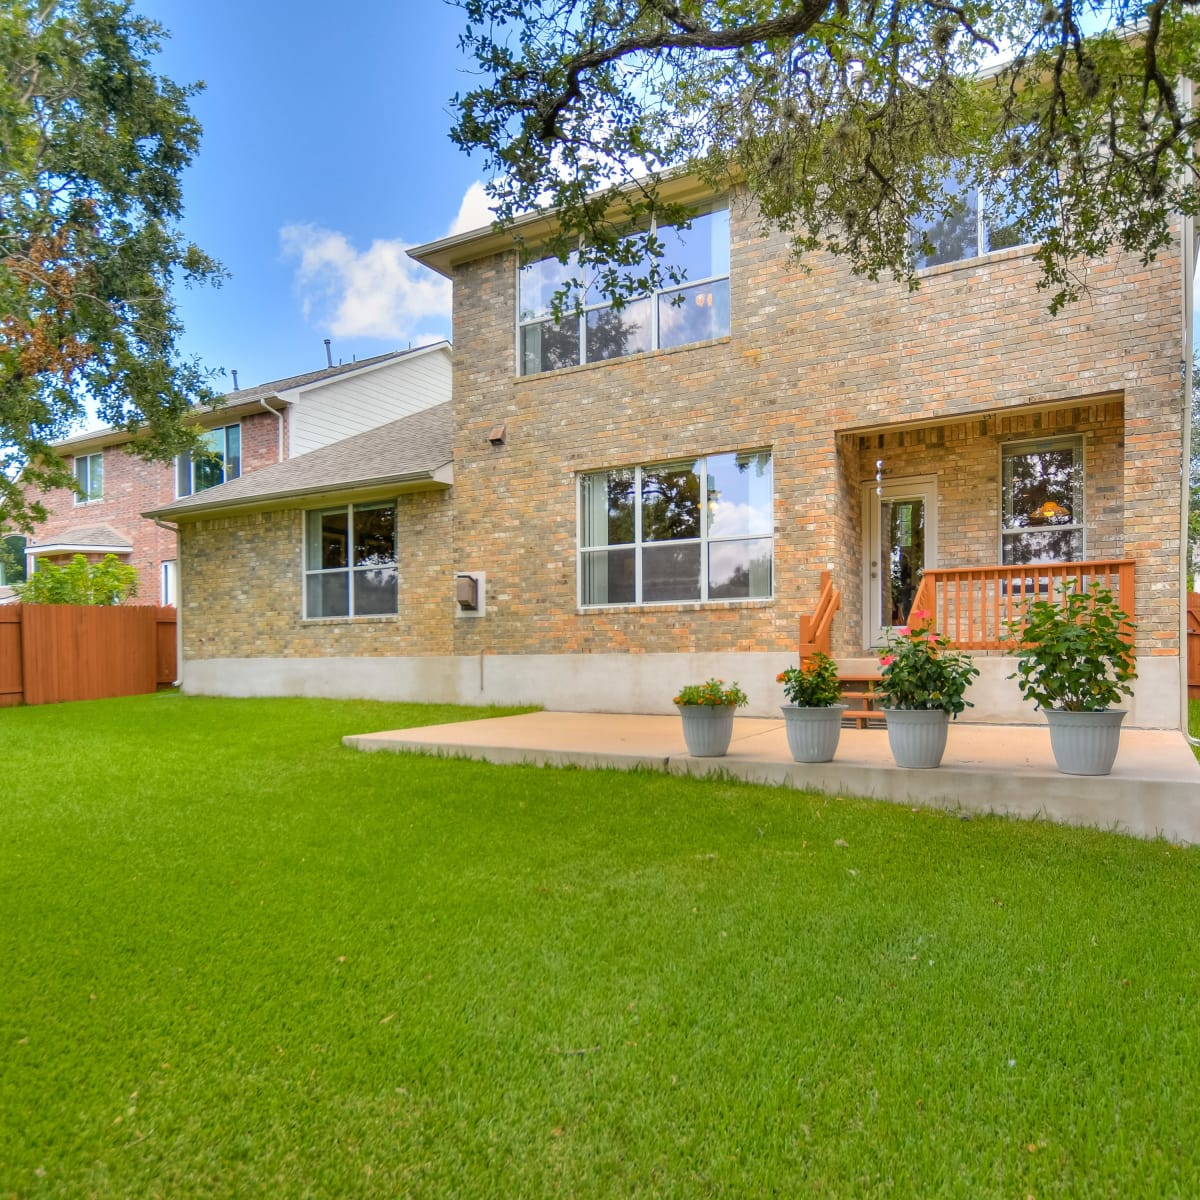 9013 Sautelle Austin house for sale backyard